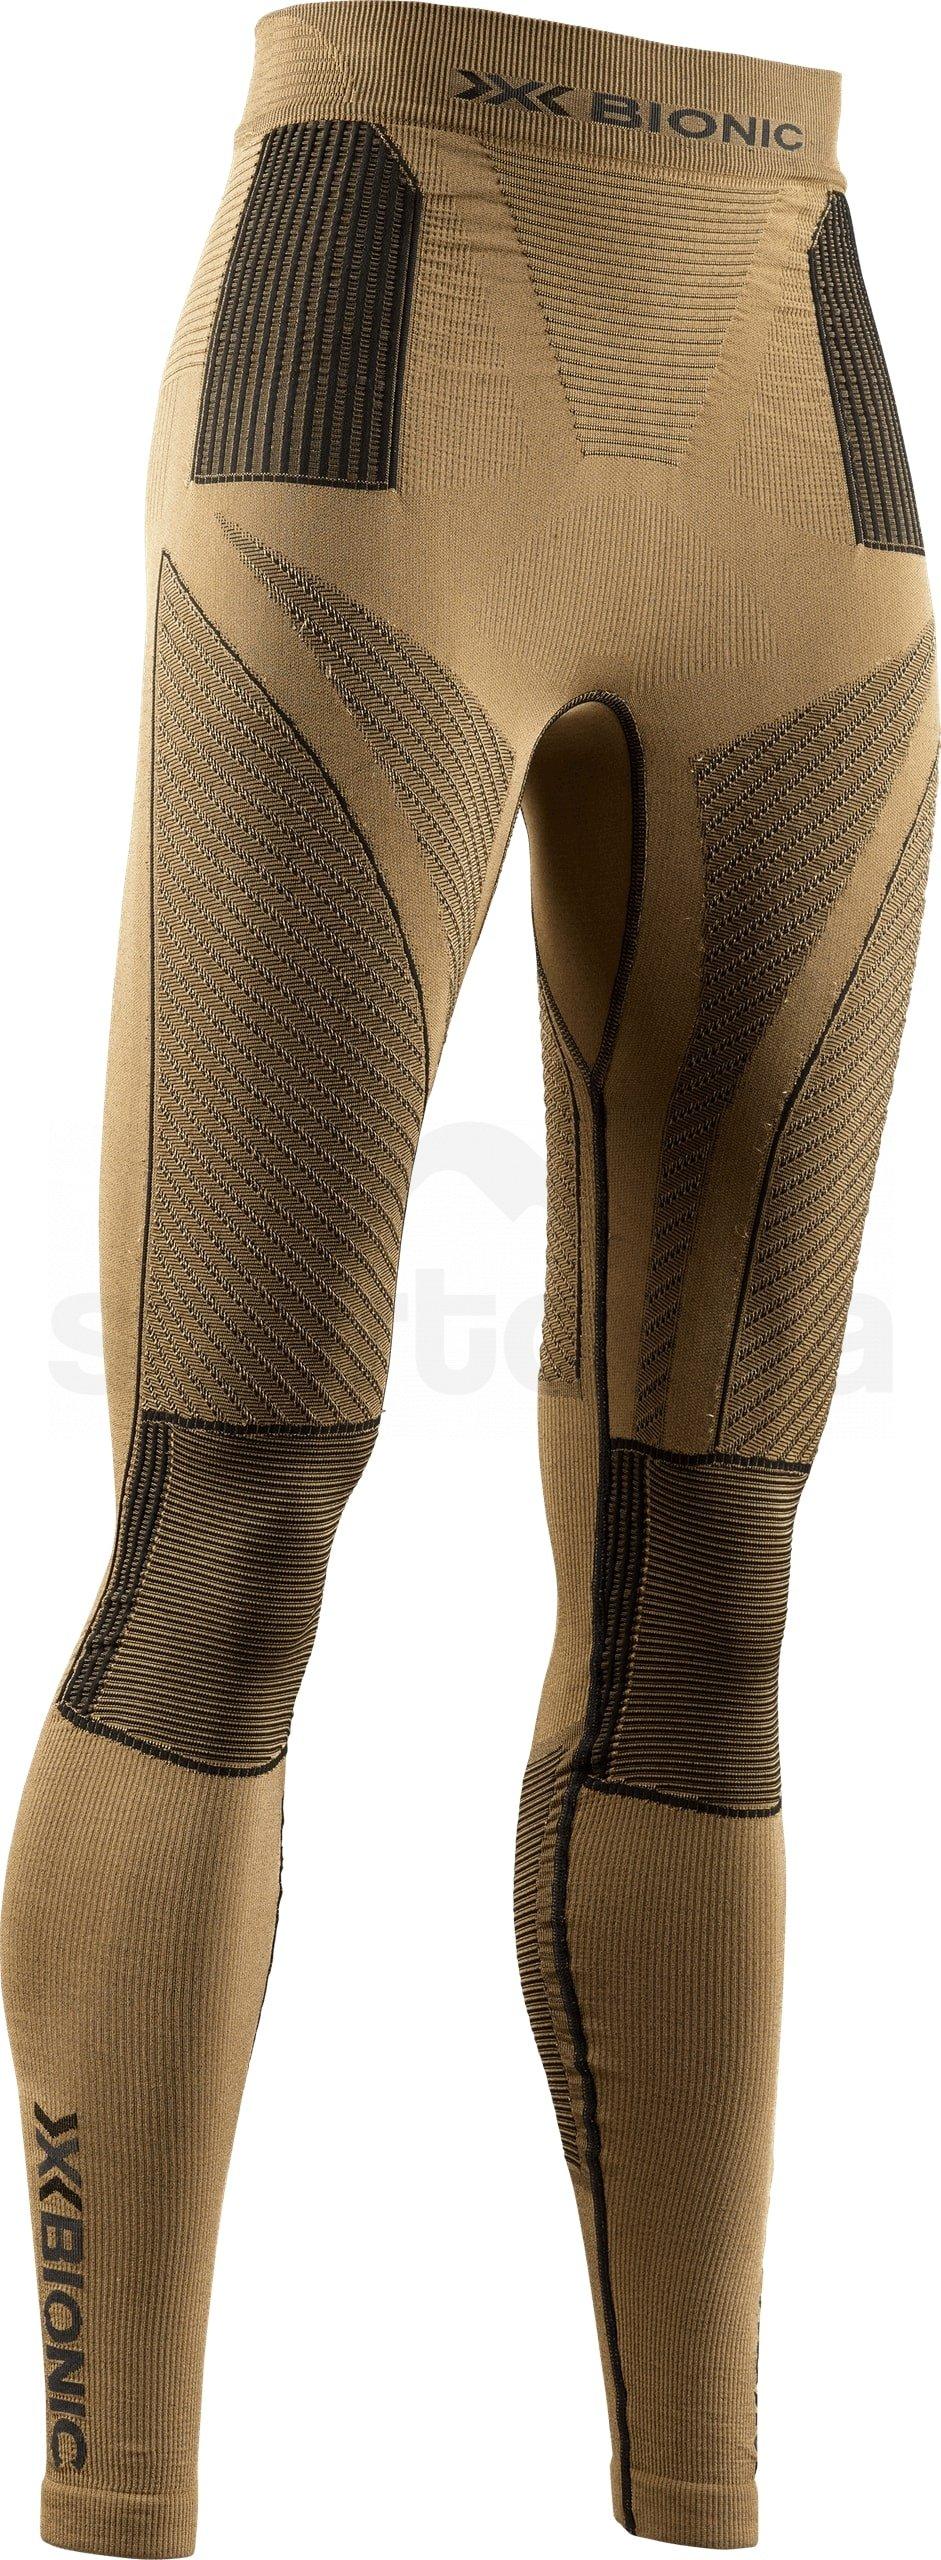 X-Bionic Radiactor 4.0 Pants LNG W